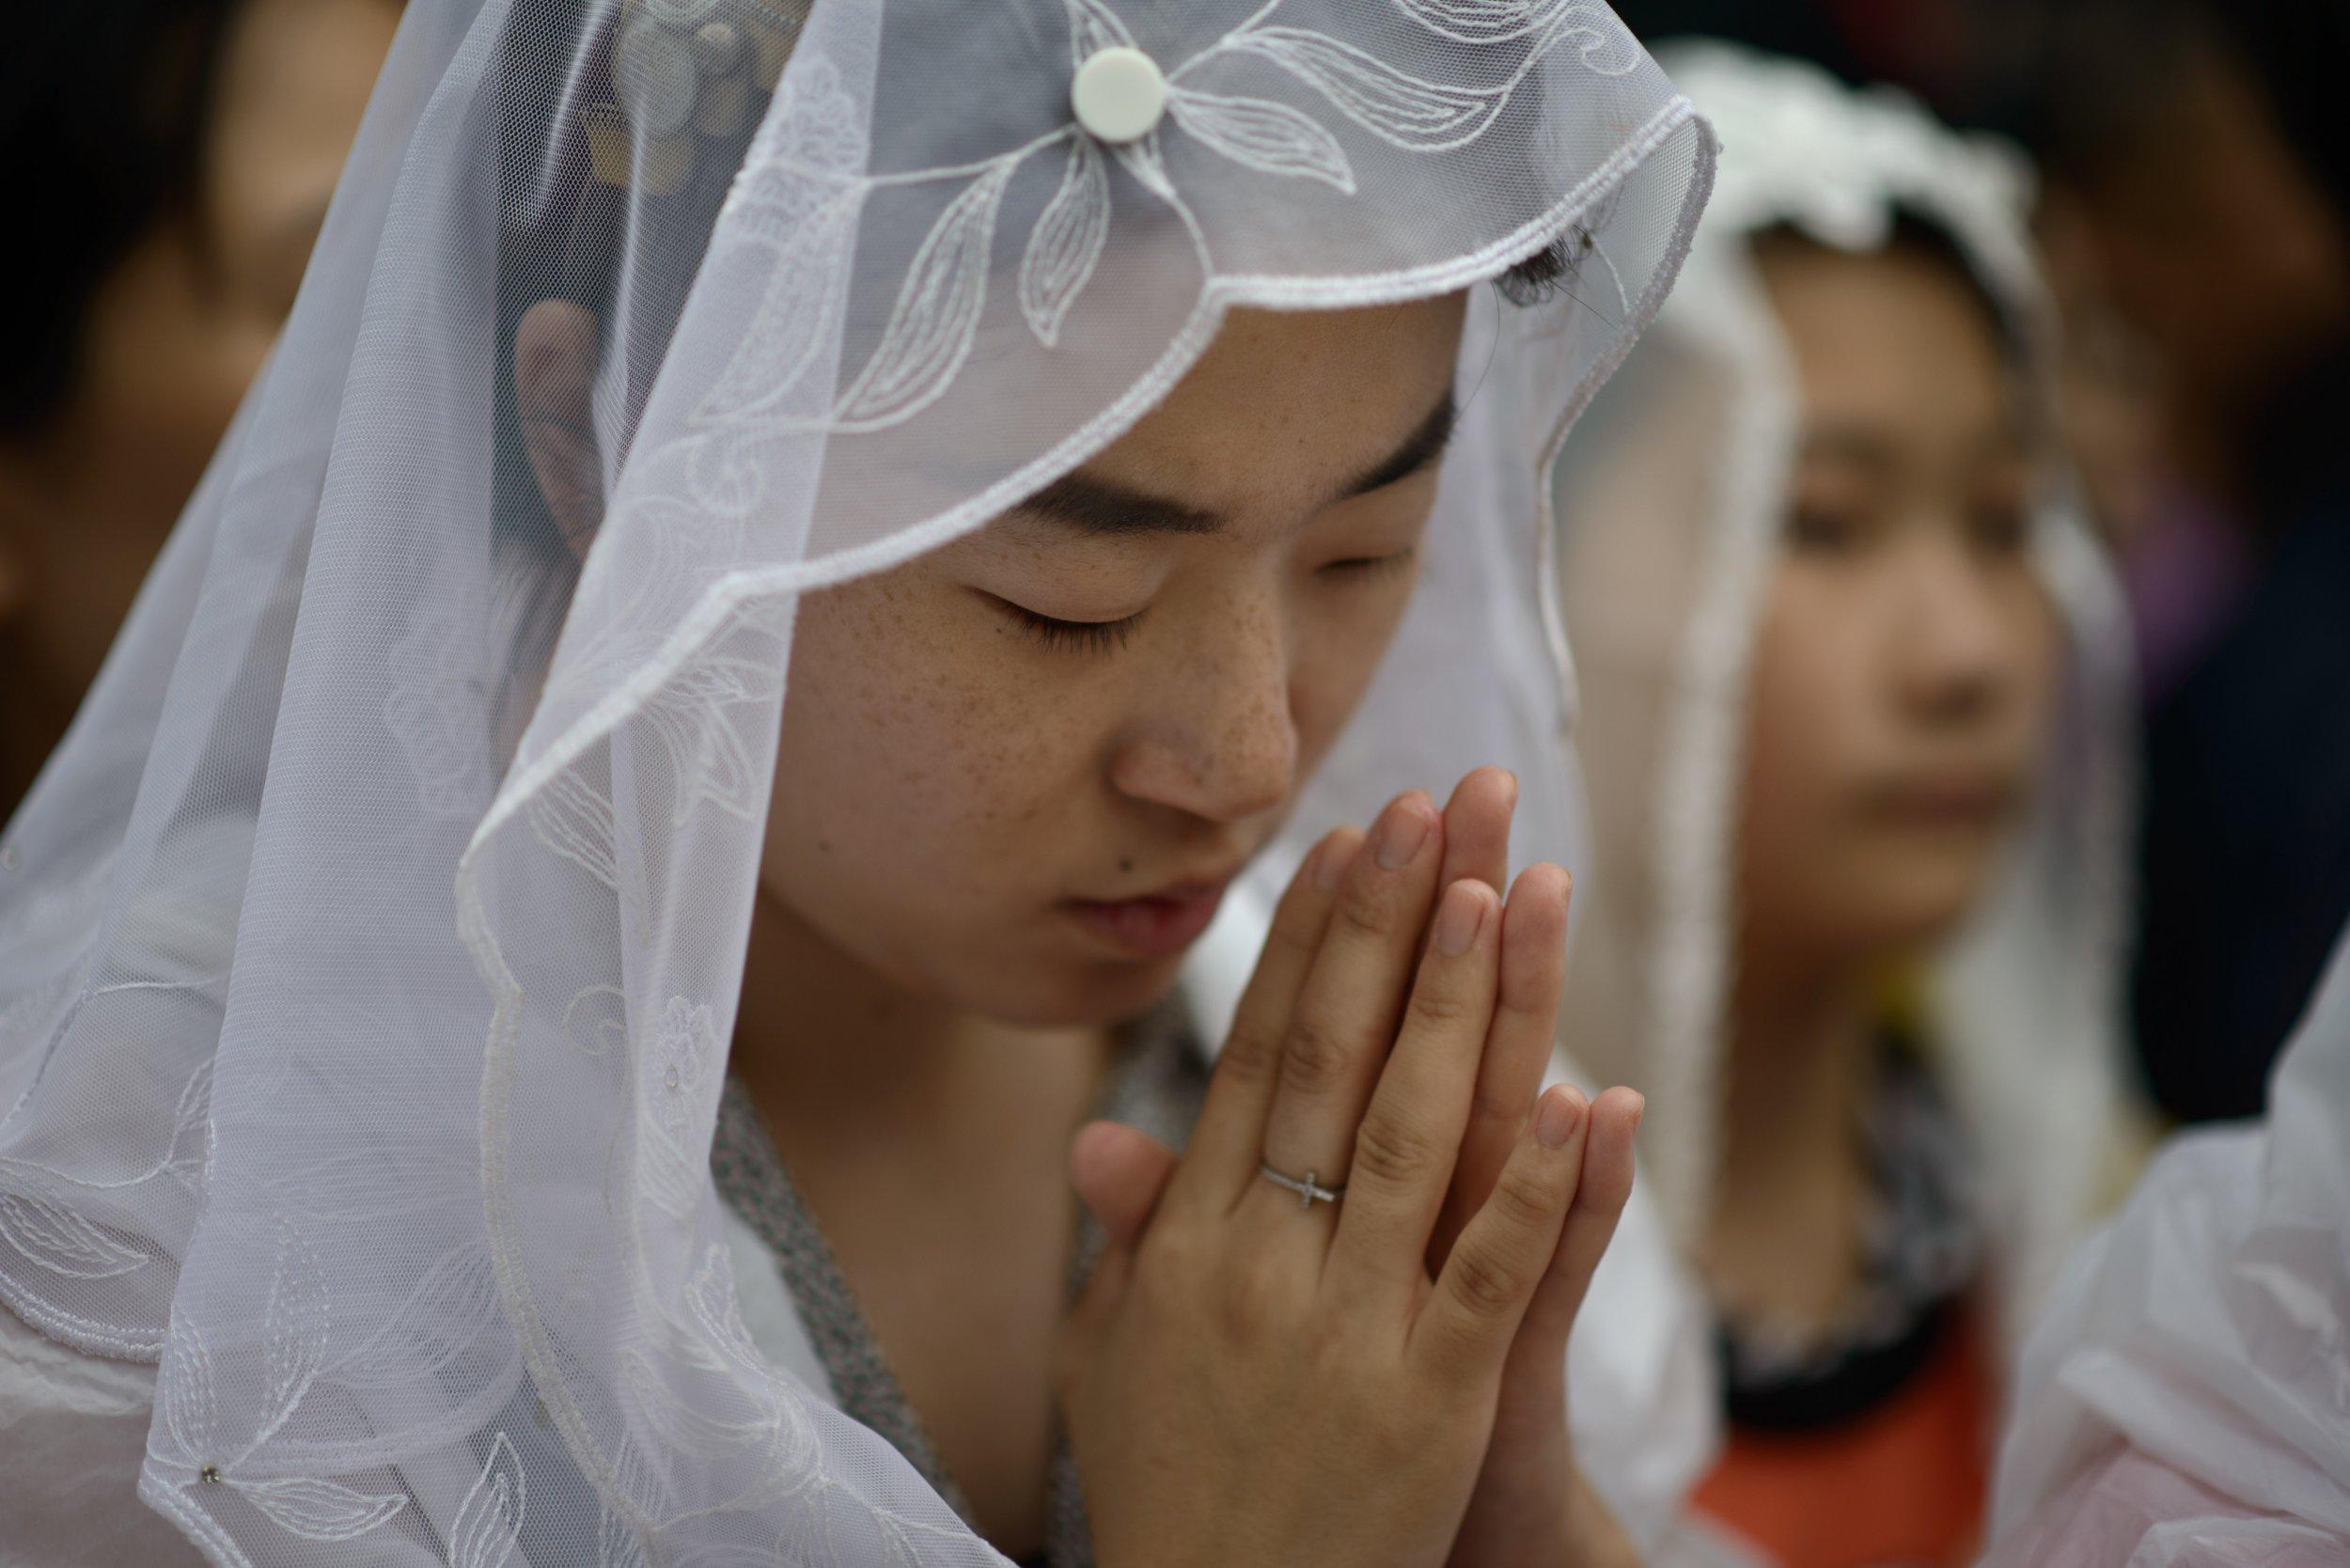 Catholics in South Korea